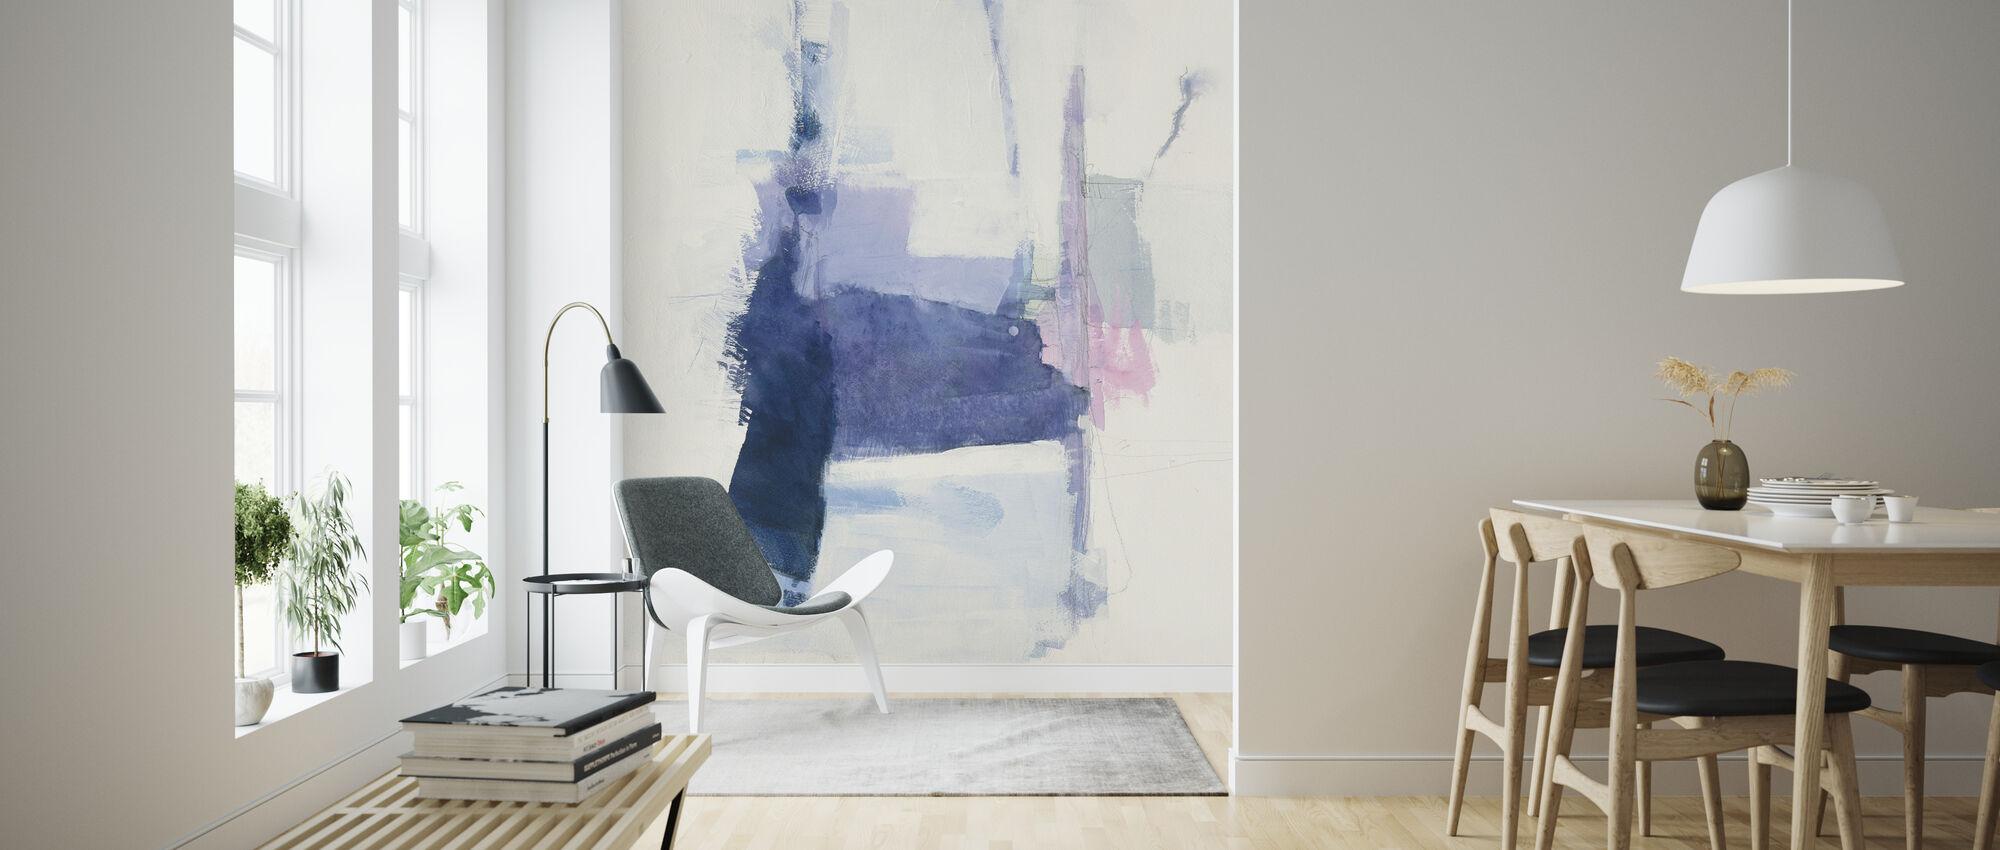 Interlude - Wallpaper - Living Room